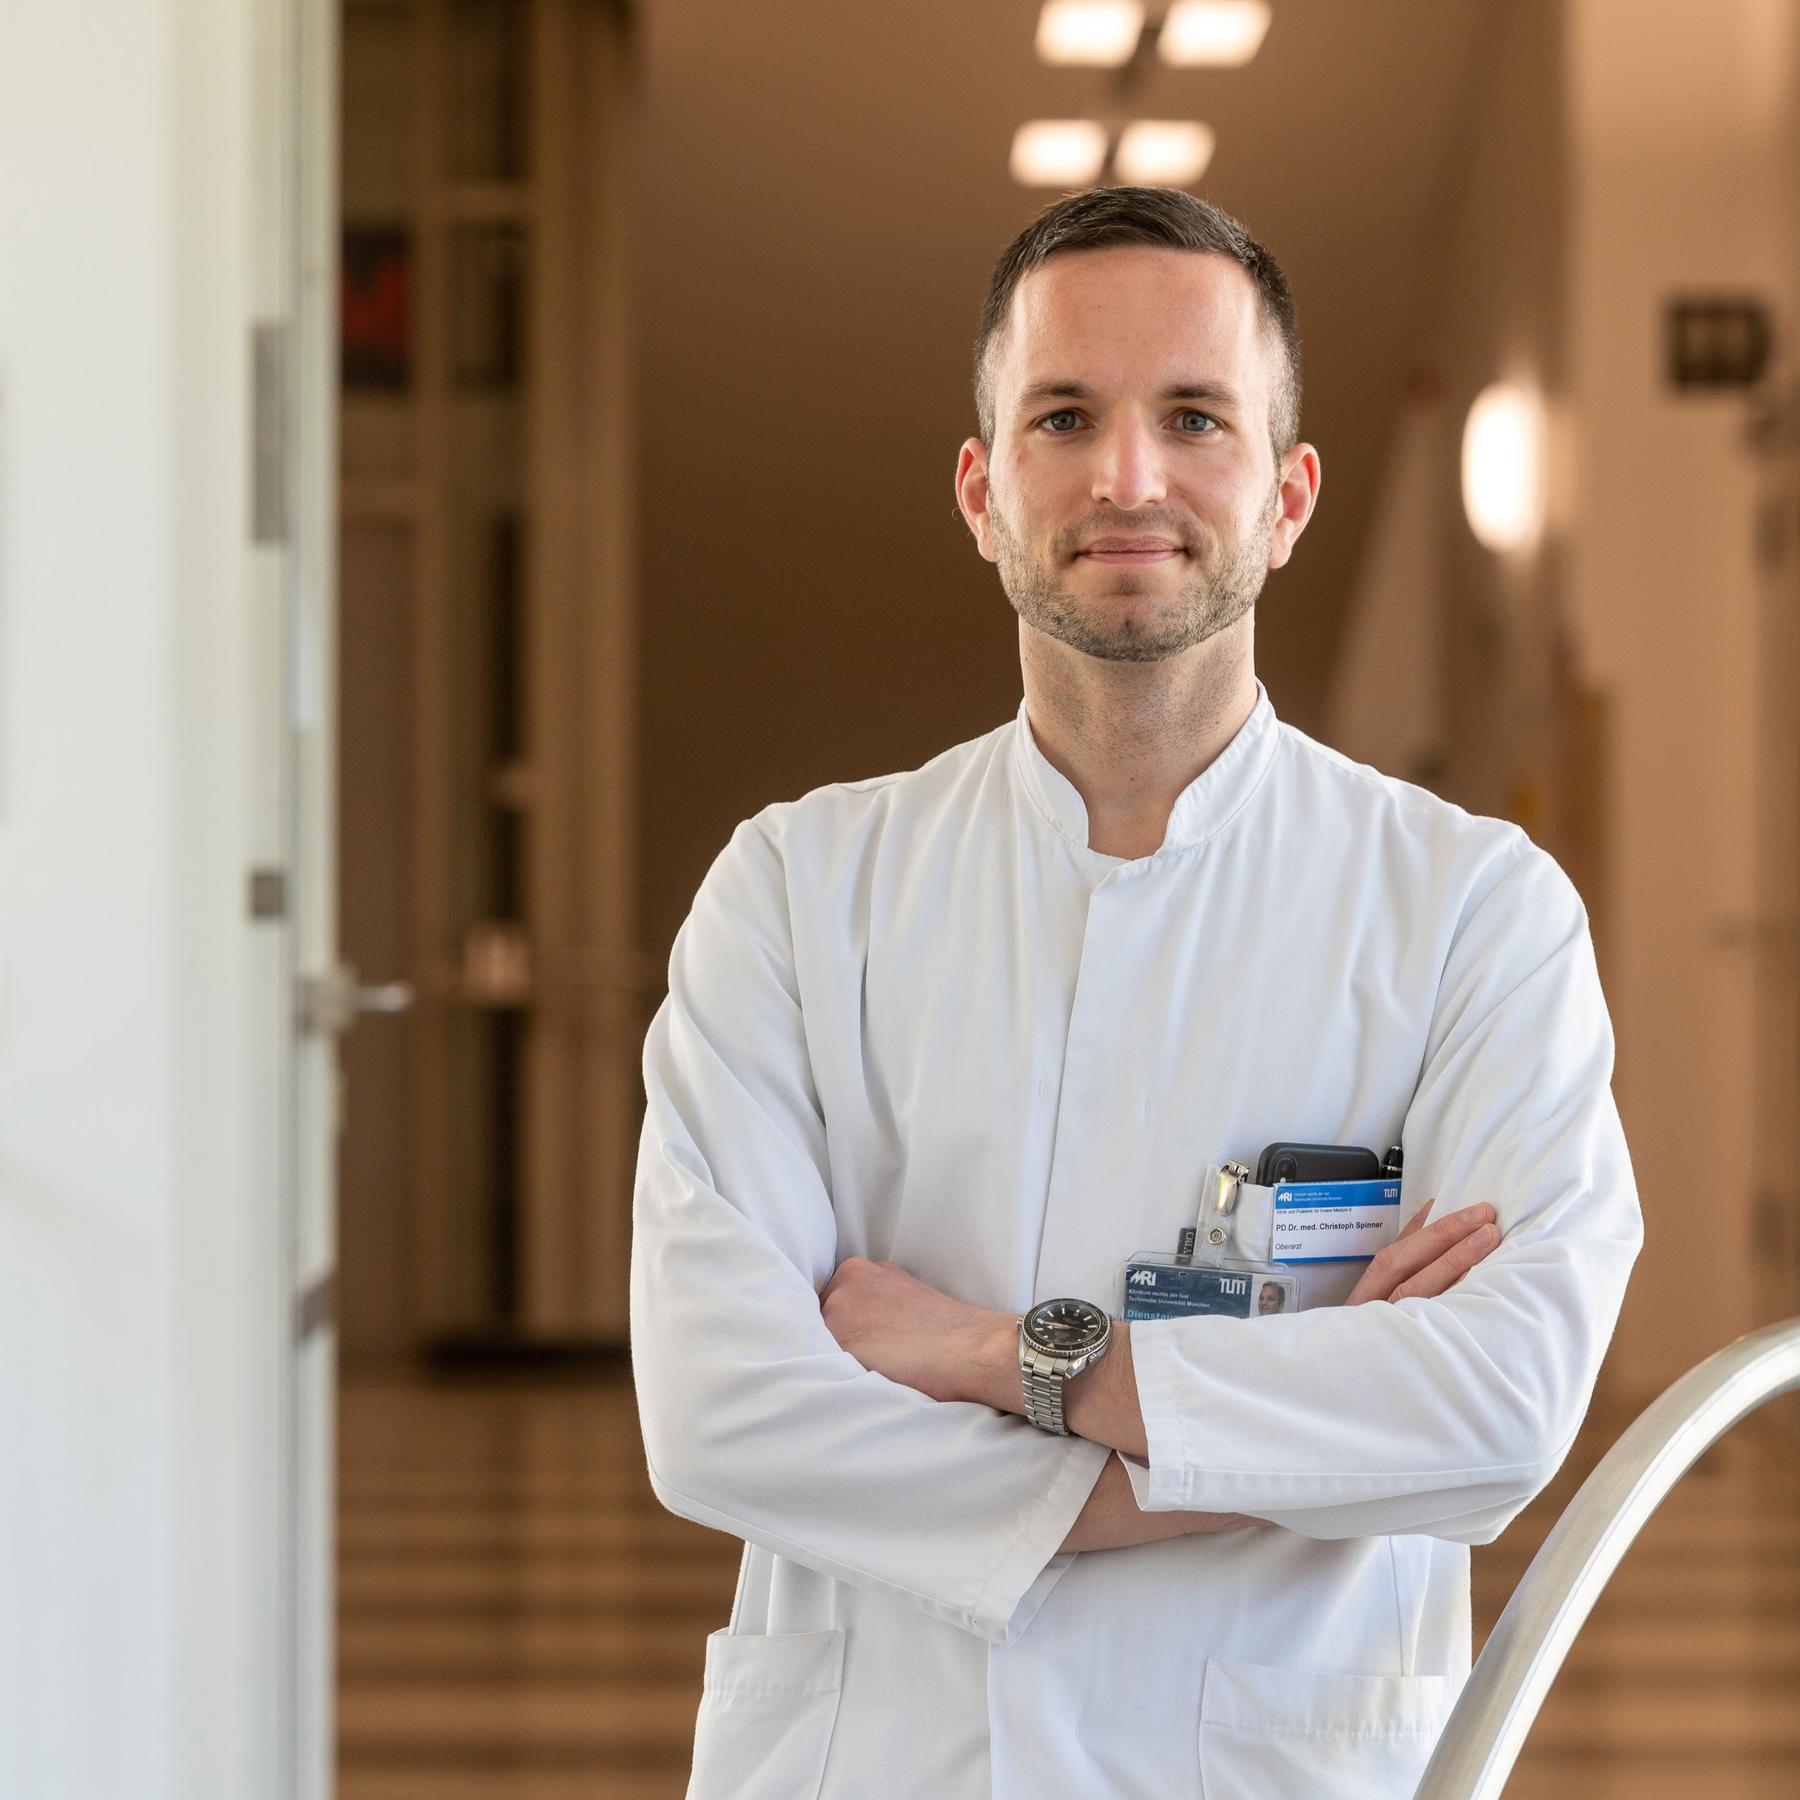 Corona-News mit Dr. Christoph Spinner (25.03.2021)